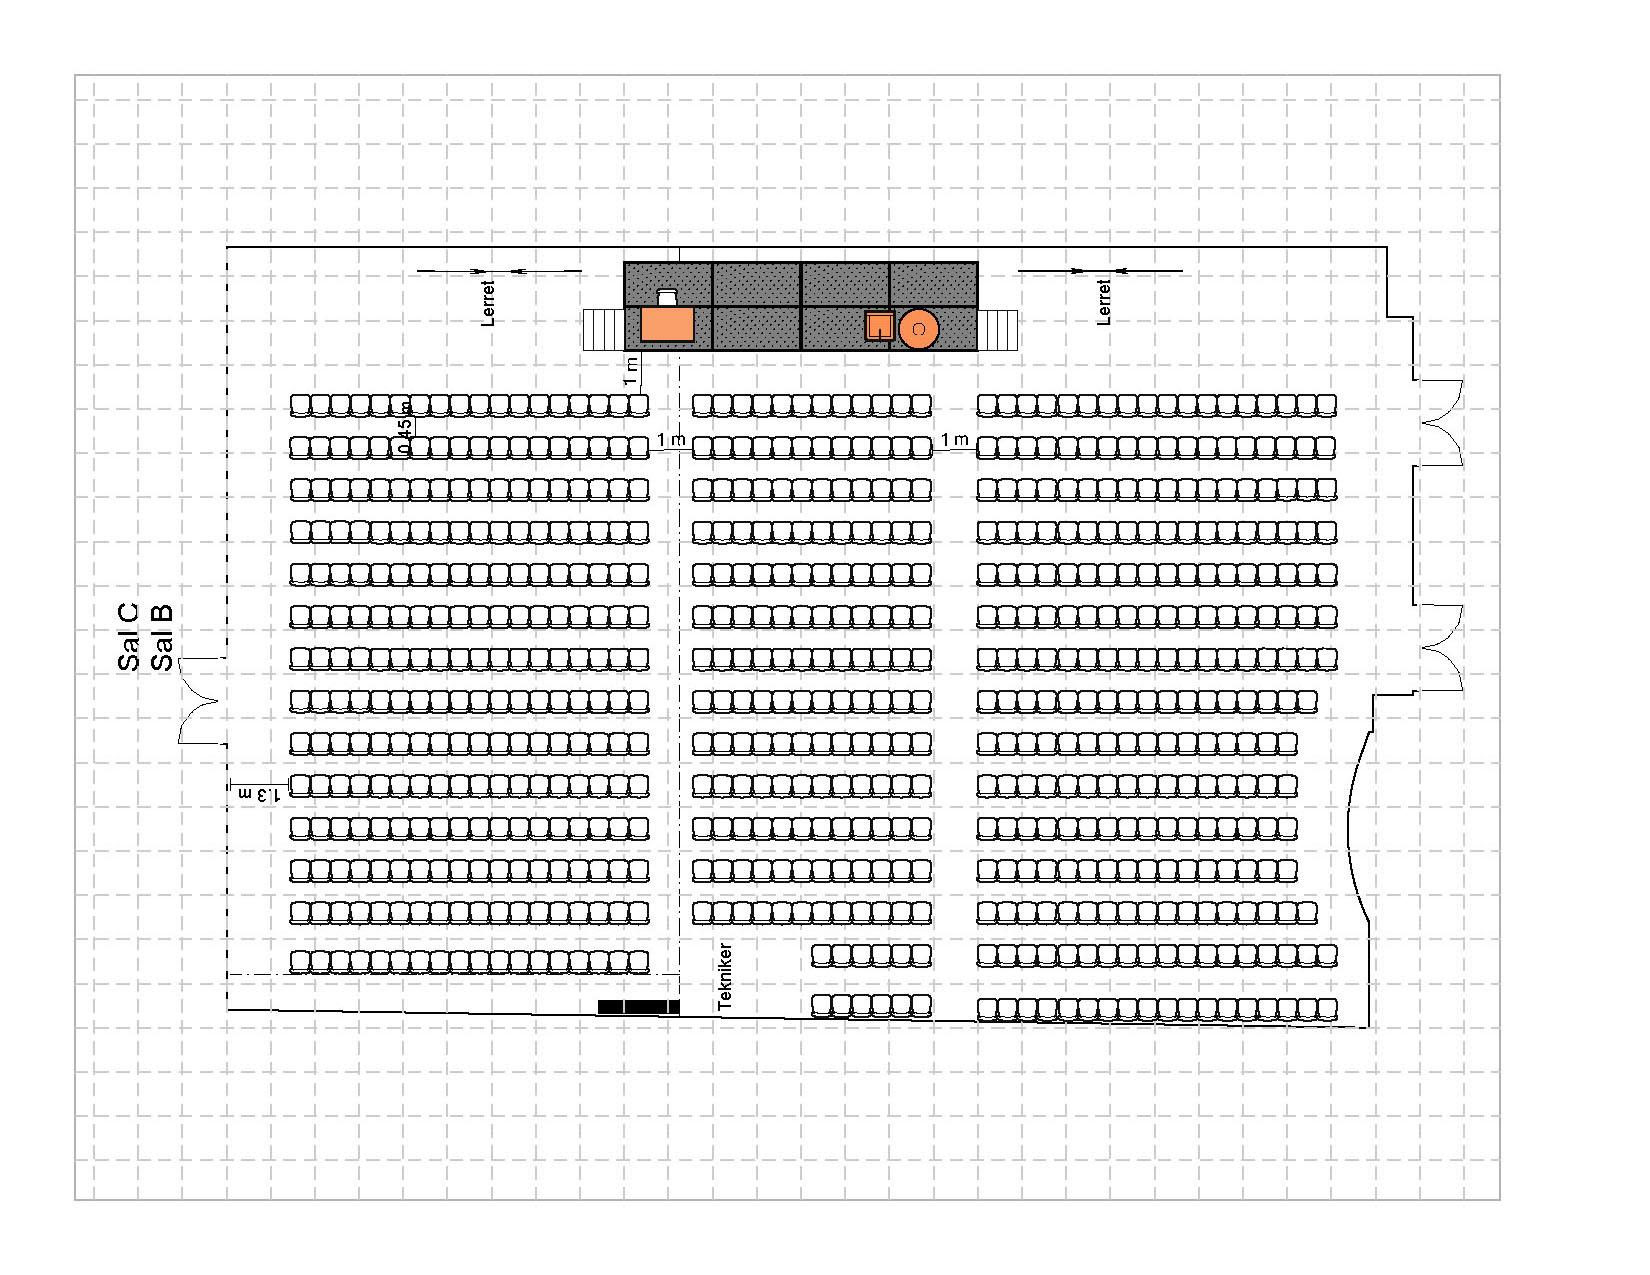 Kino 680 plasser